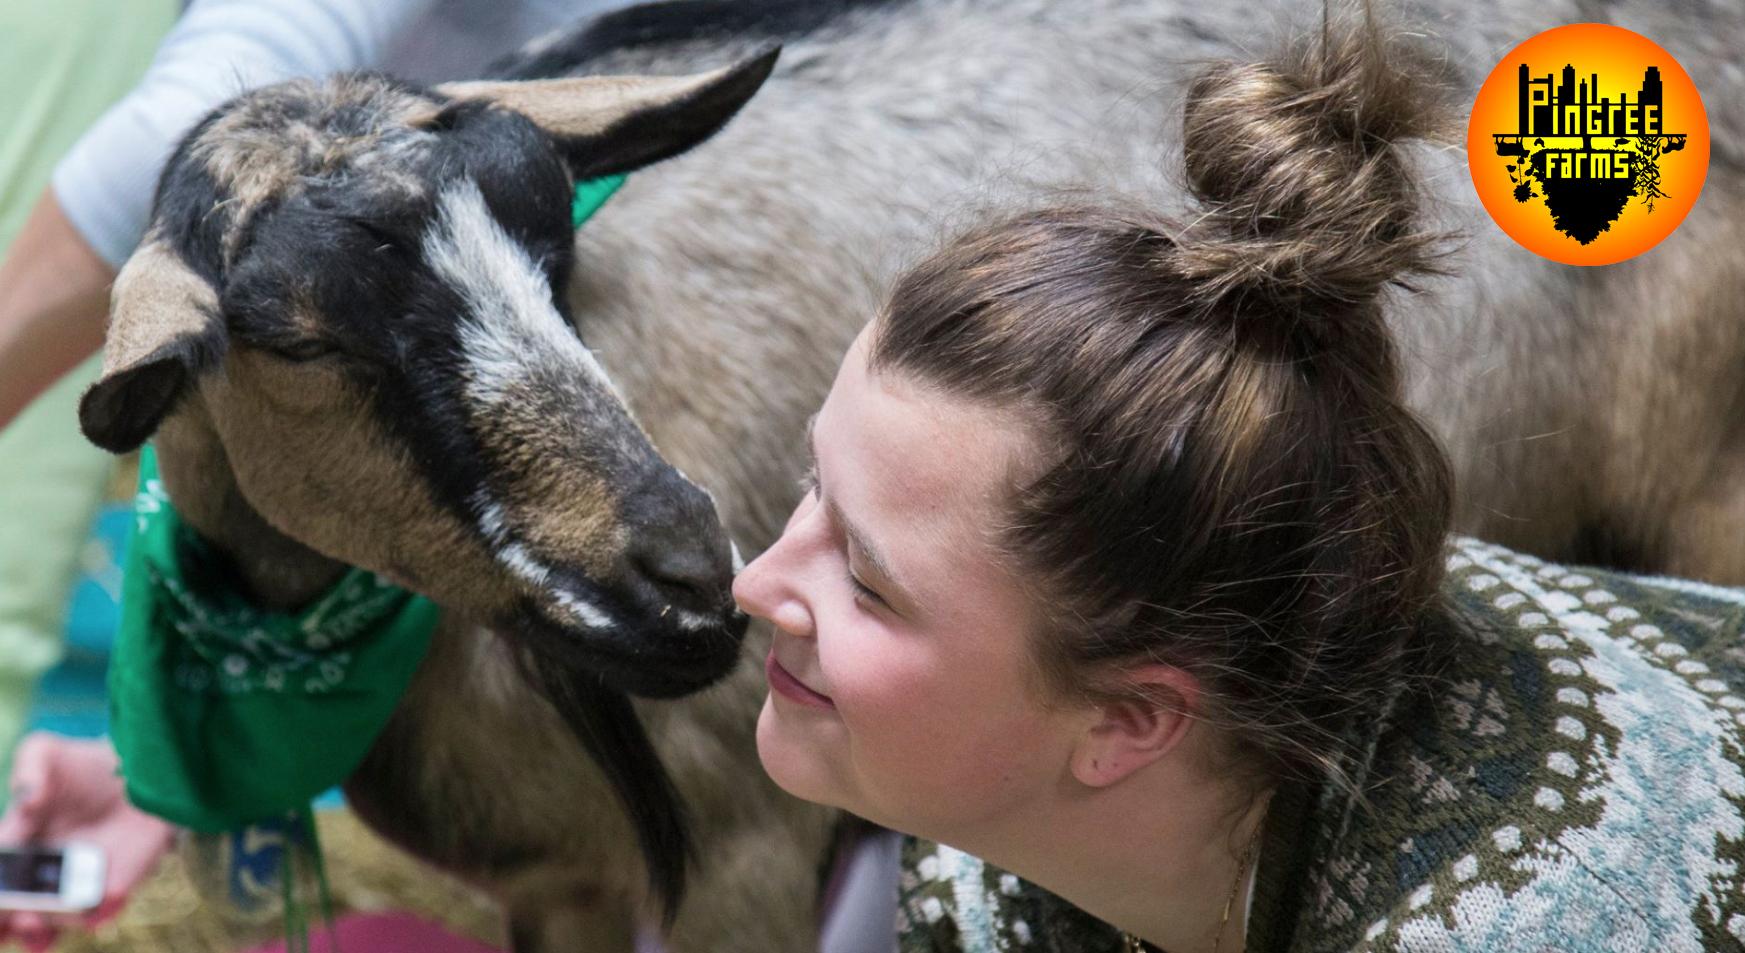 Pingree Farms Goat Yoga Is B A A A Ck